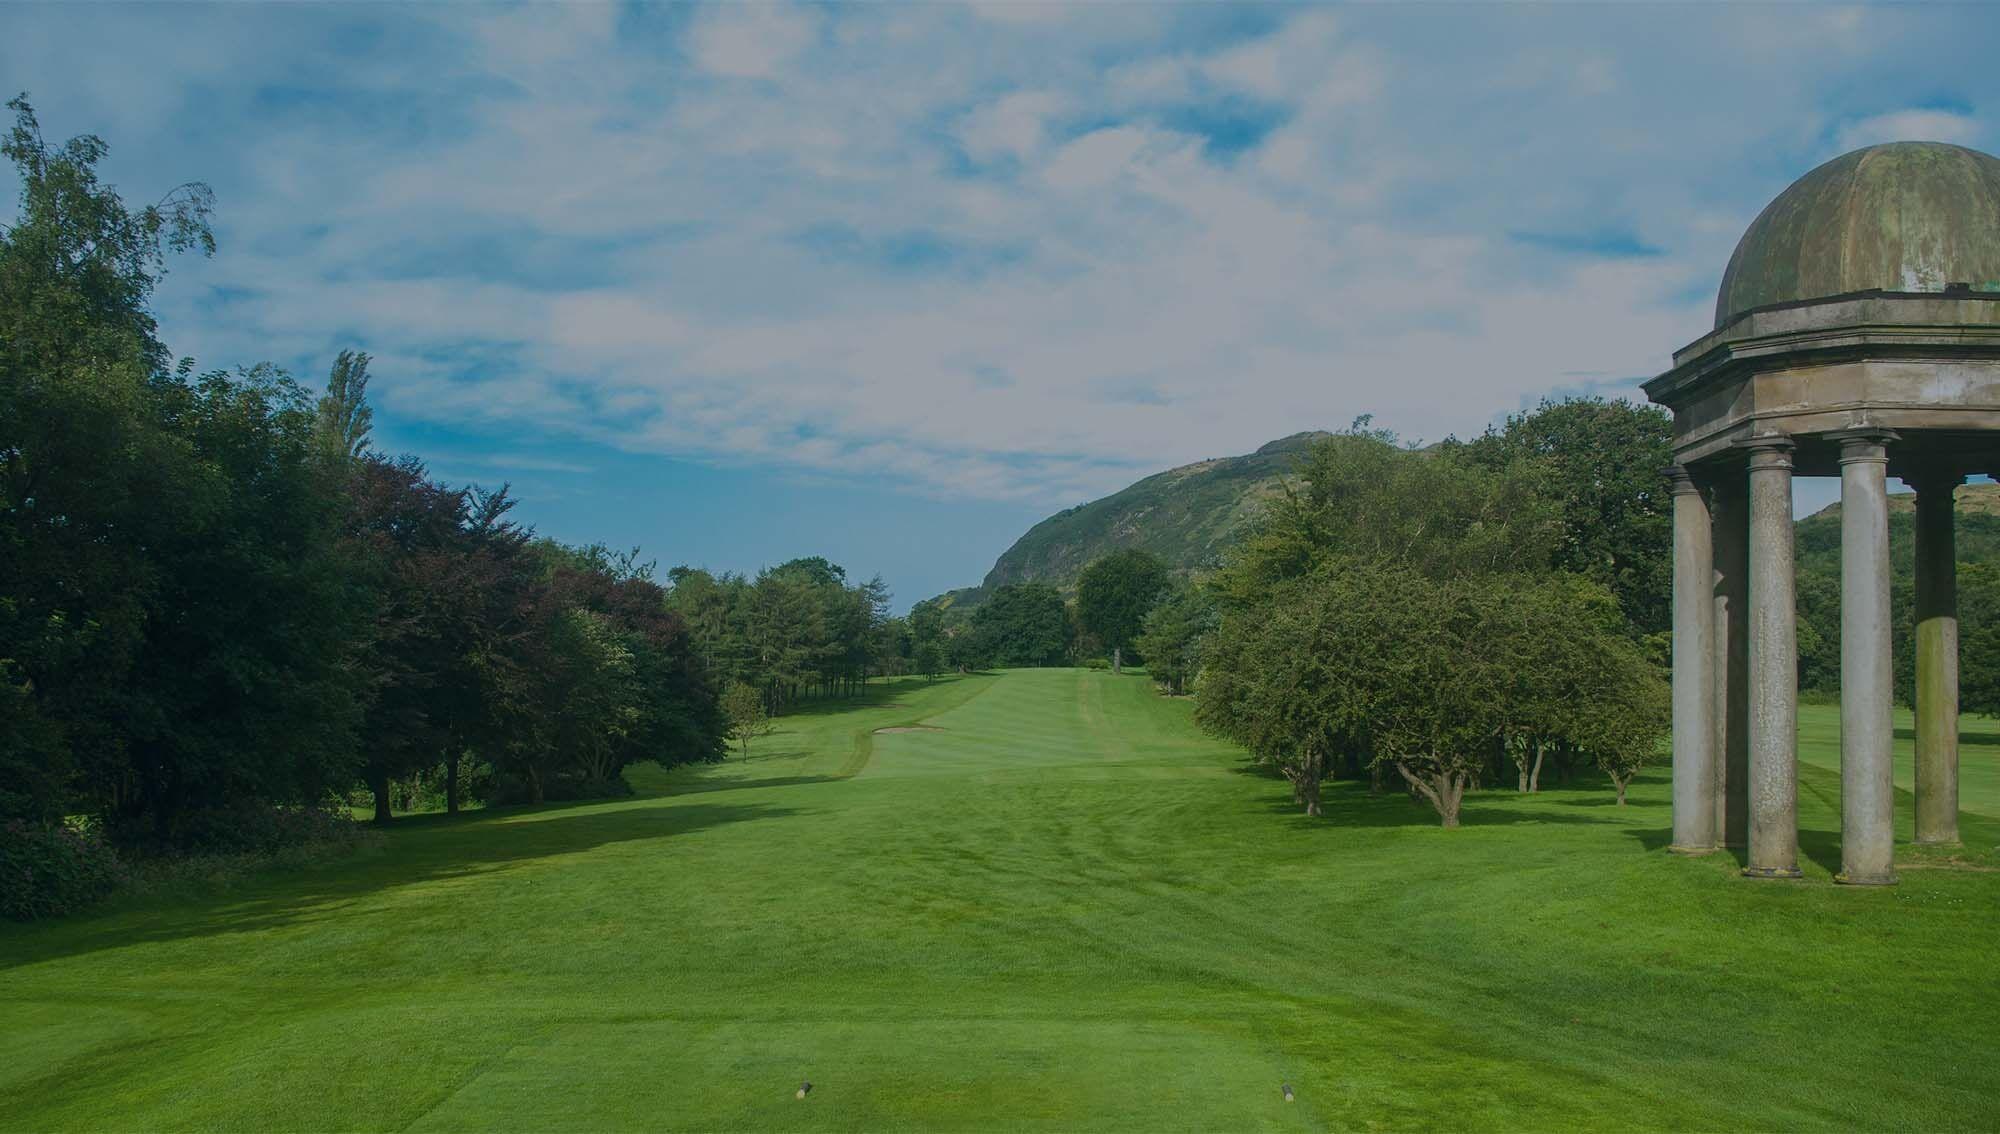 Duddingston Golf Club Gallery Image 1